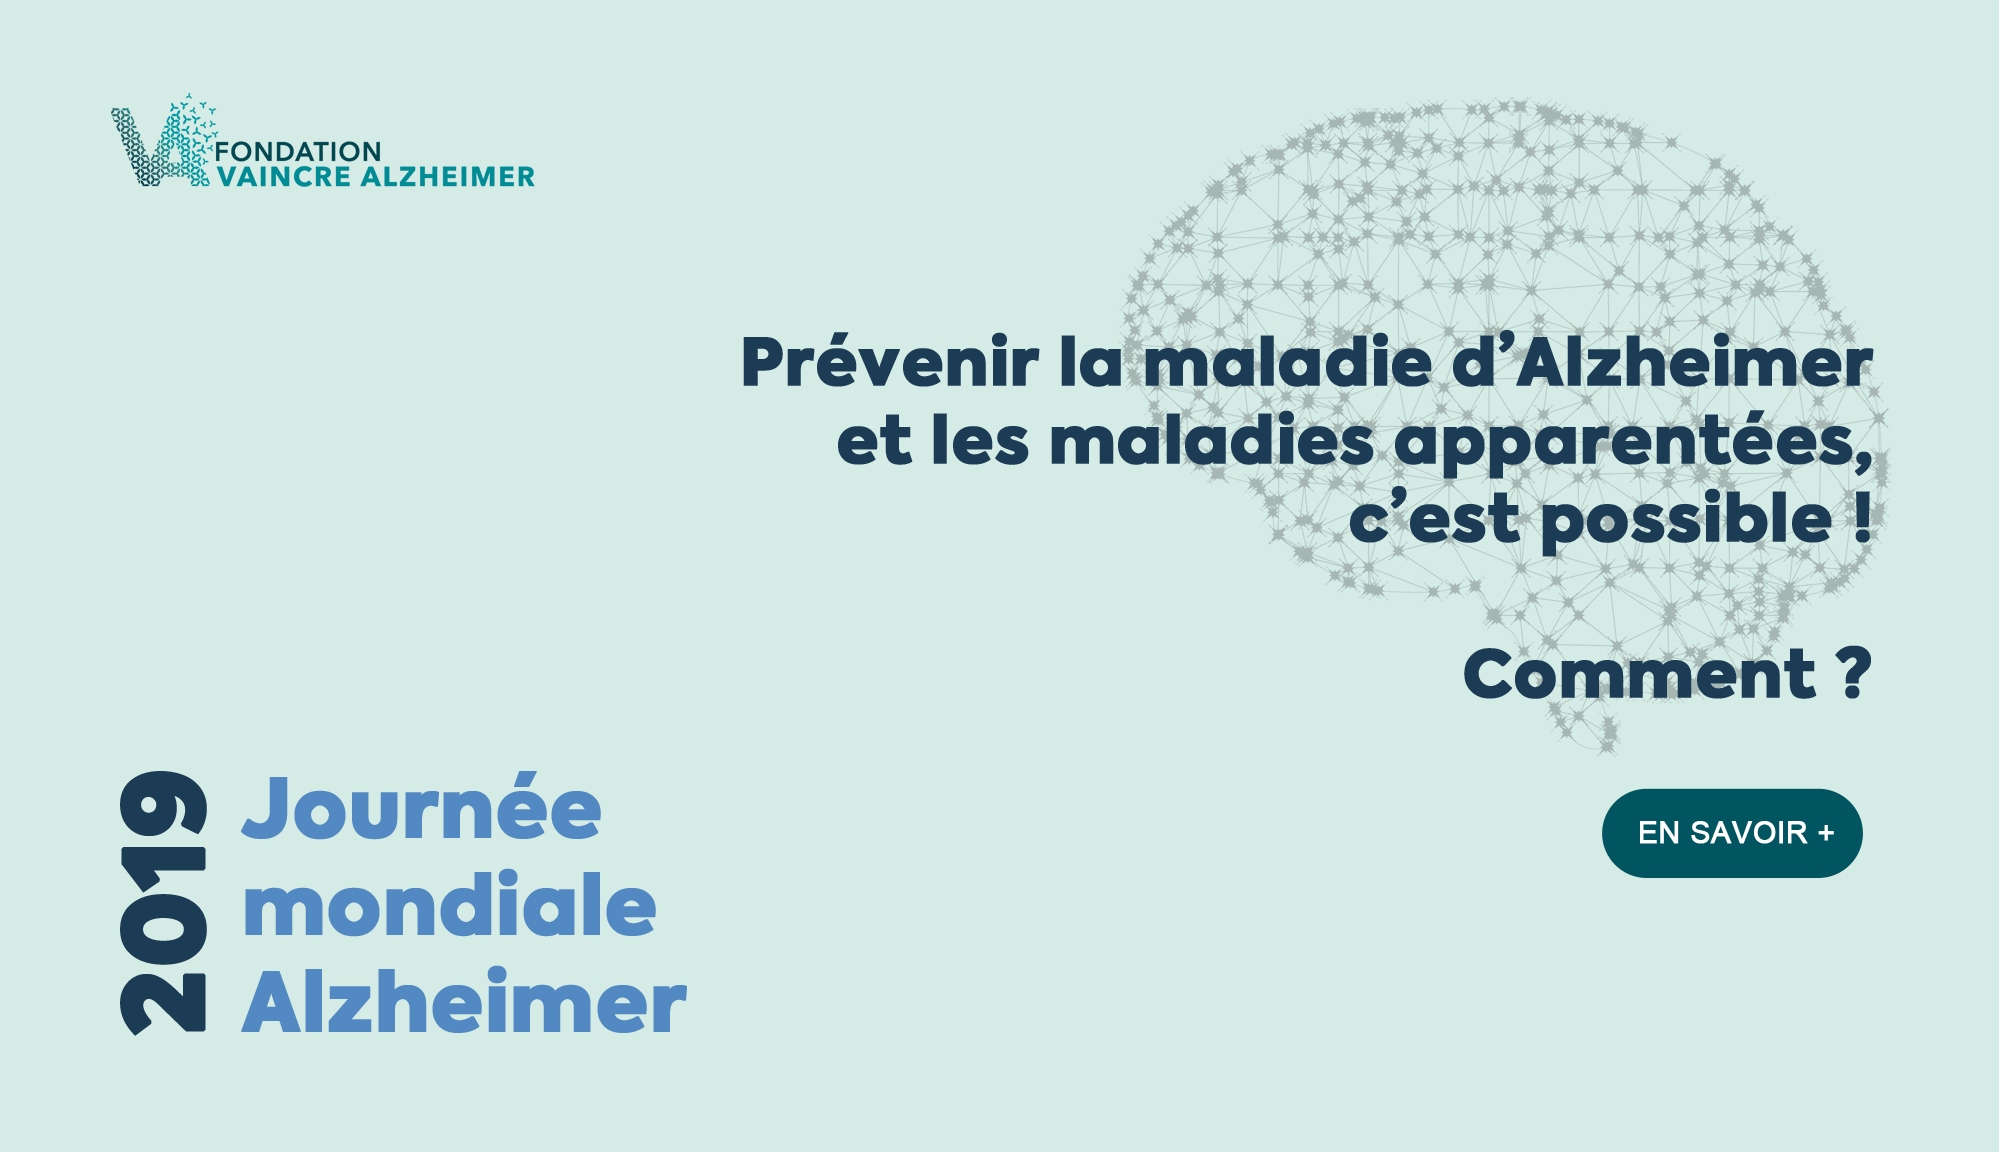 Journée mondiale Alzheimer 2019